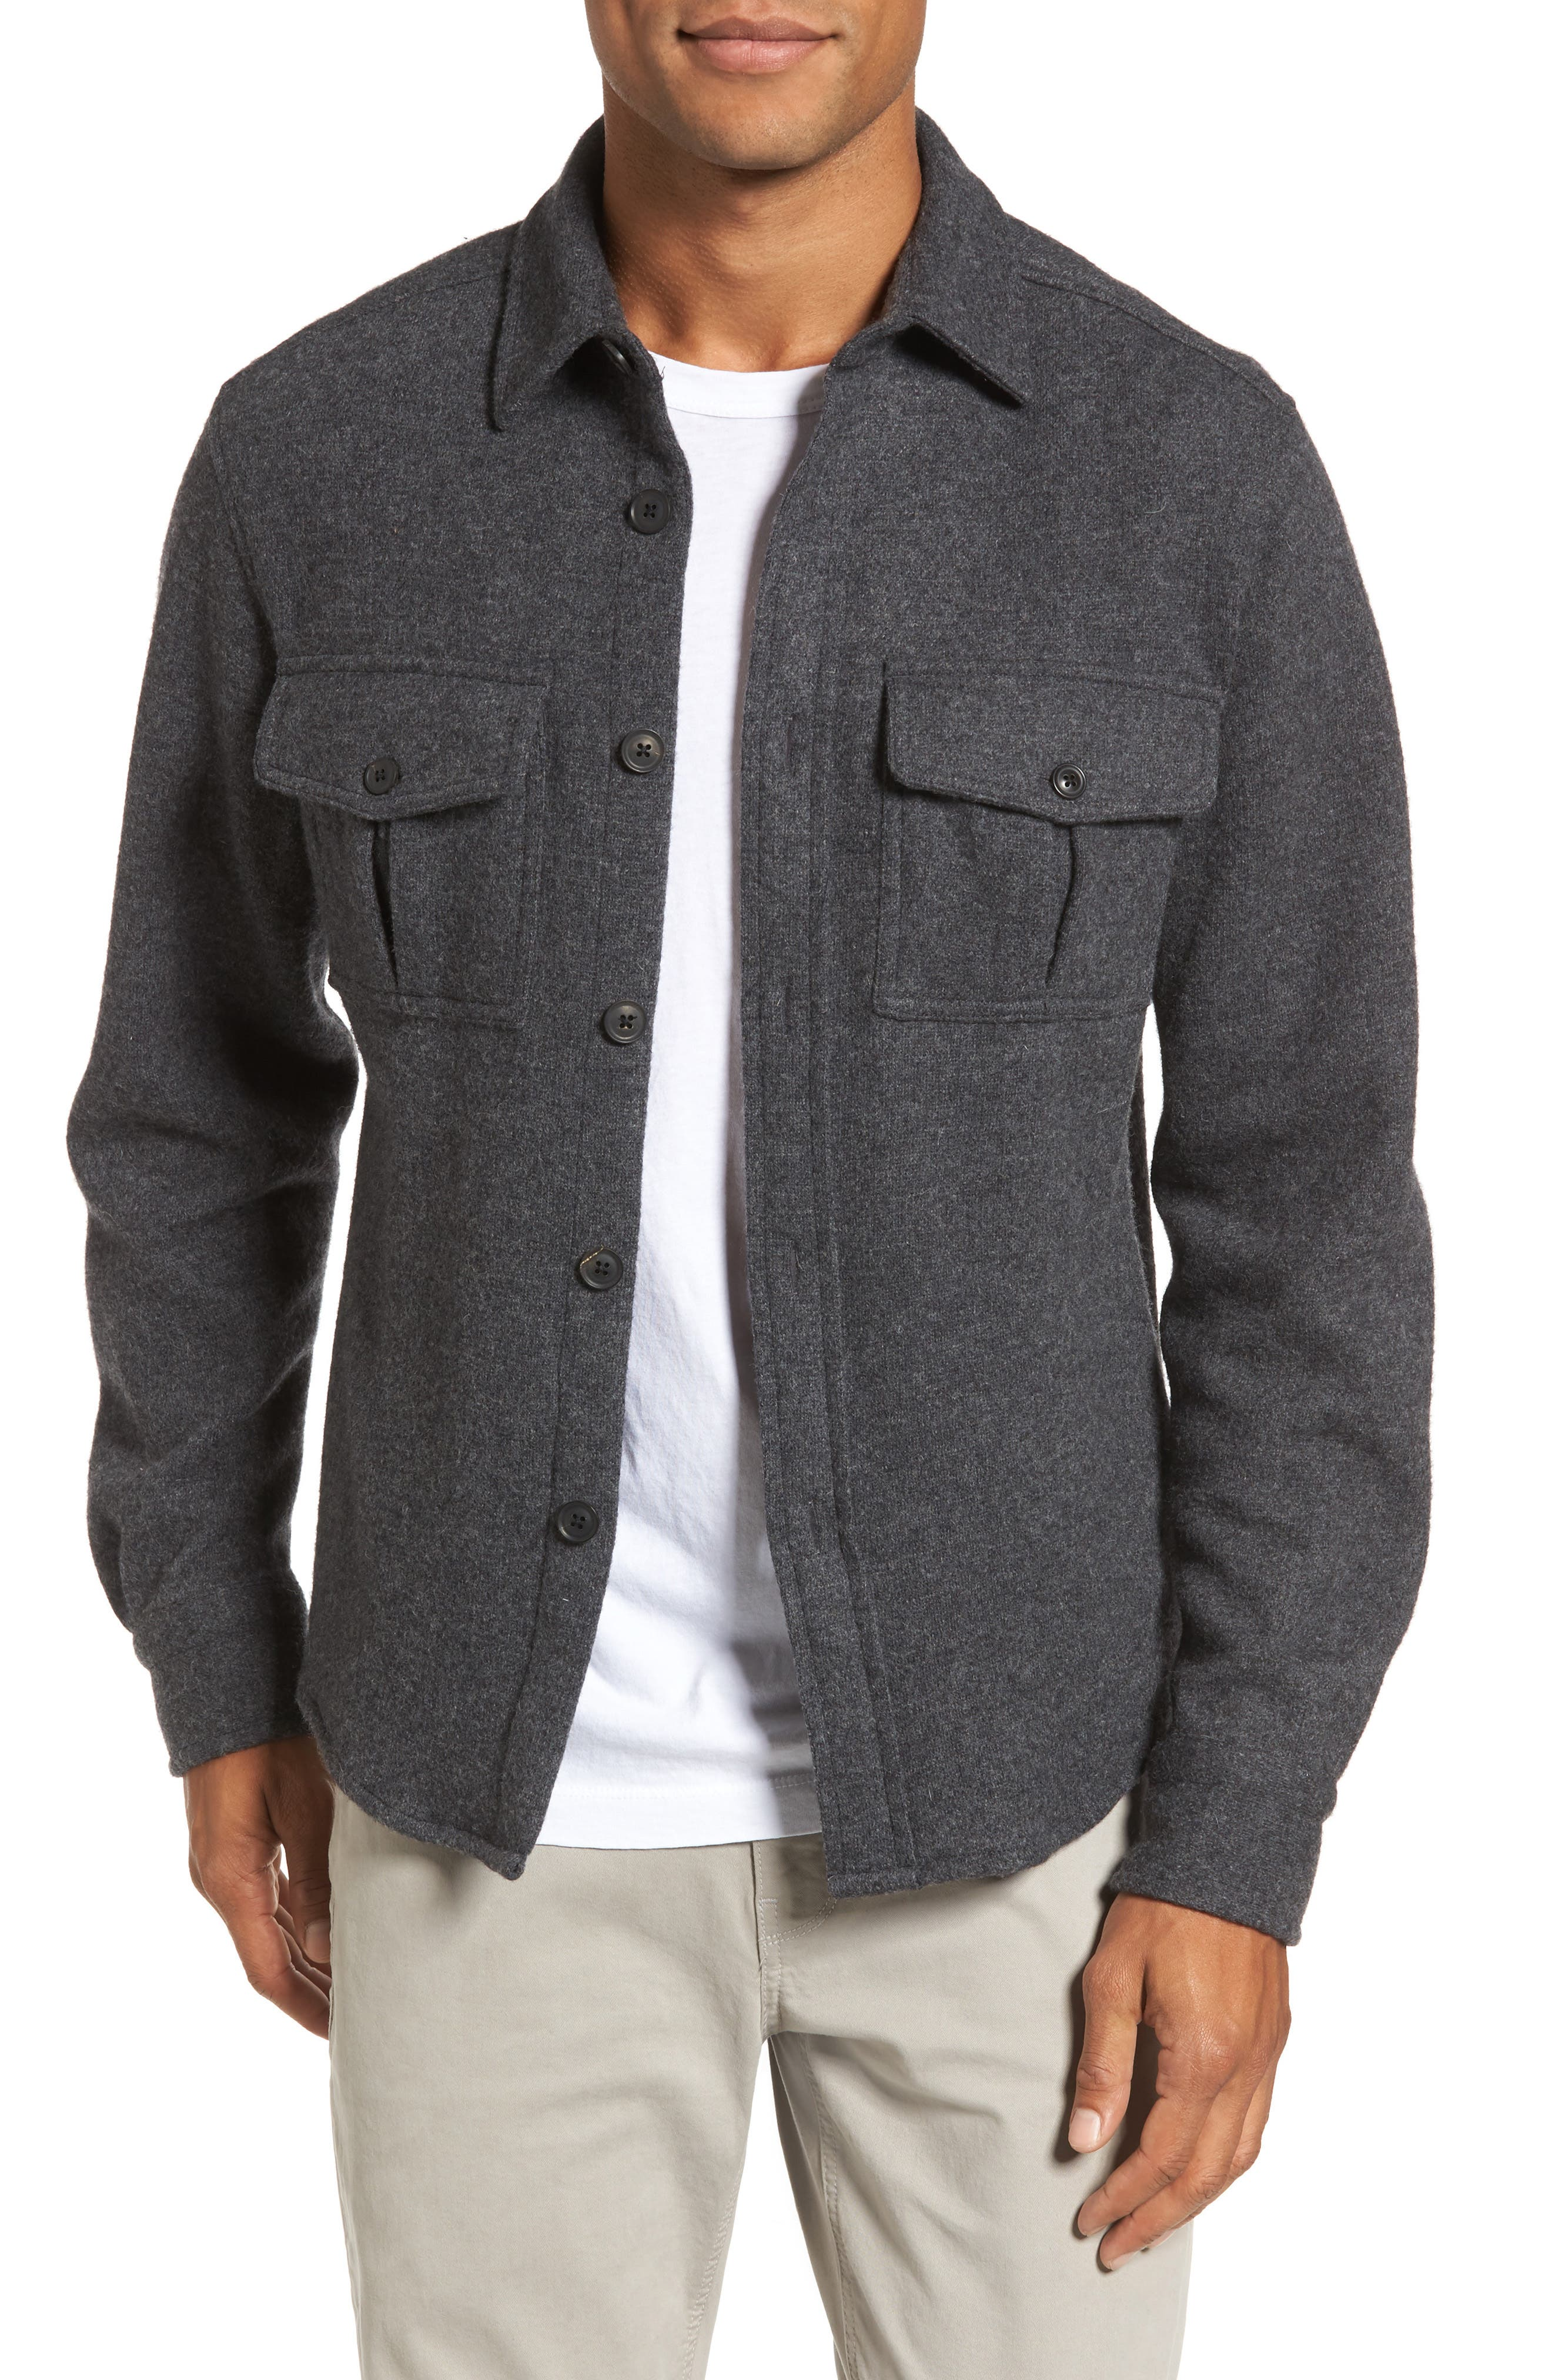 Gant G1 Jersey Commuter CPO Jacket